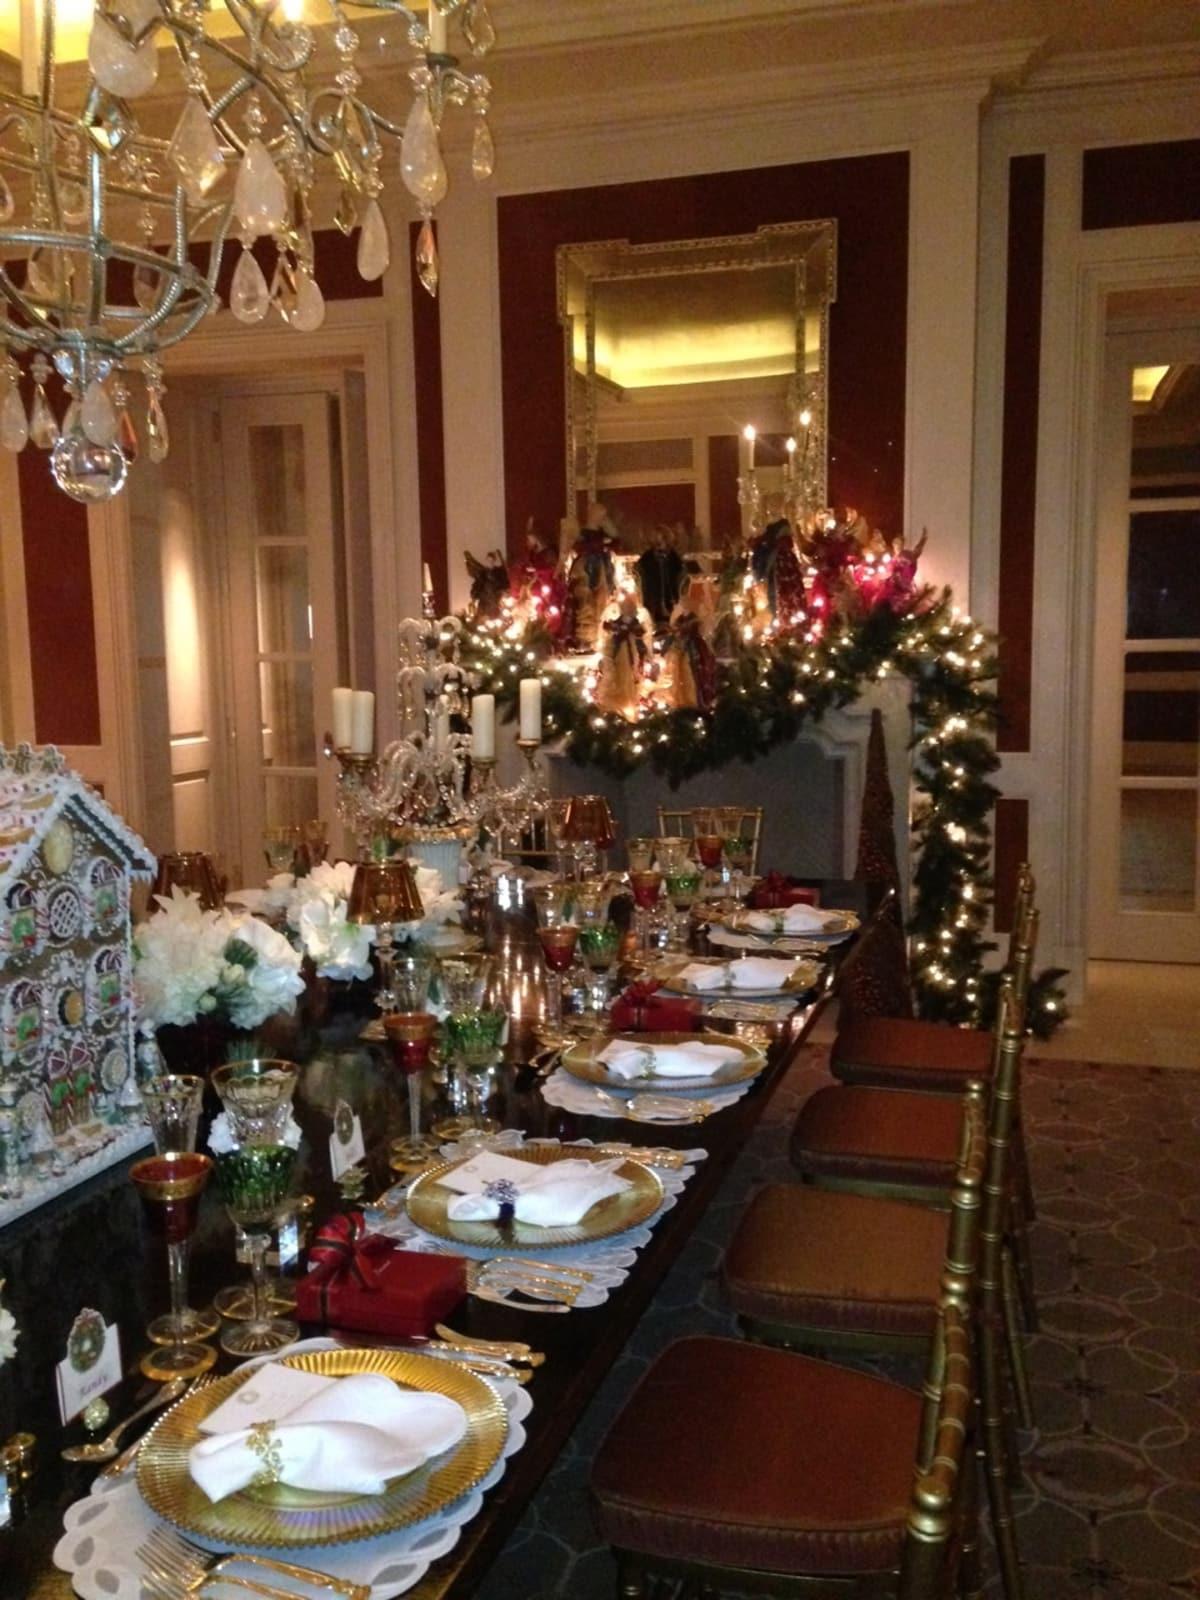 News, Shelby, Christmas Tabletop, July 2015